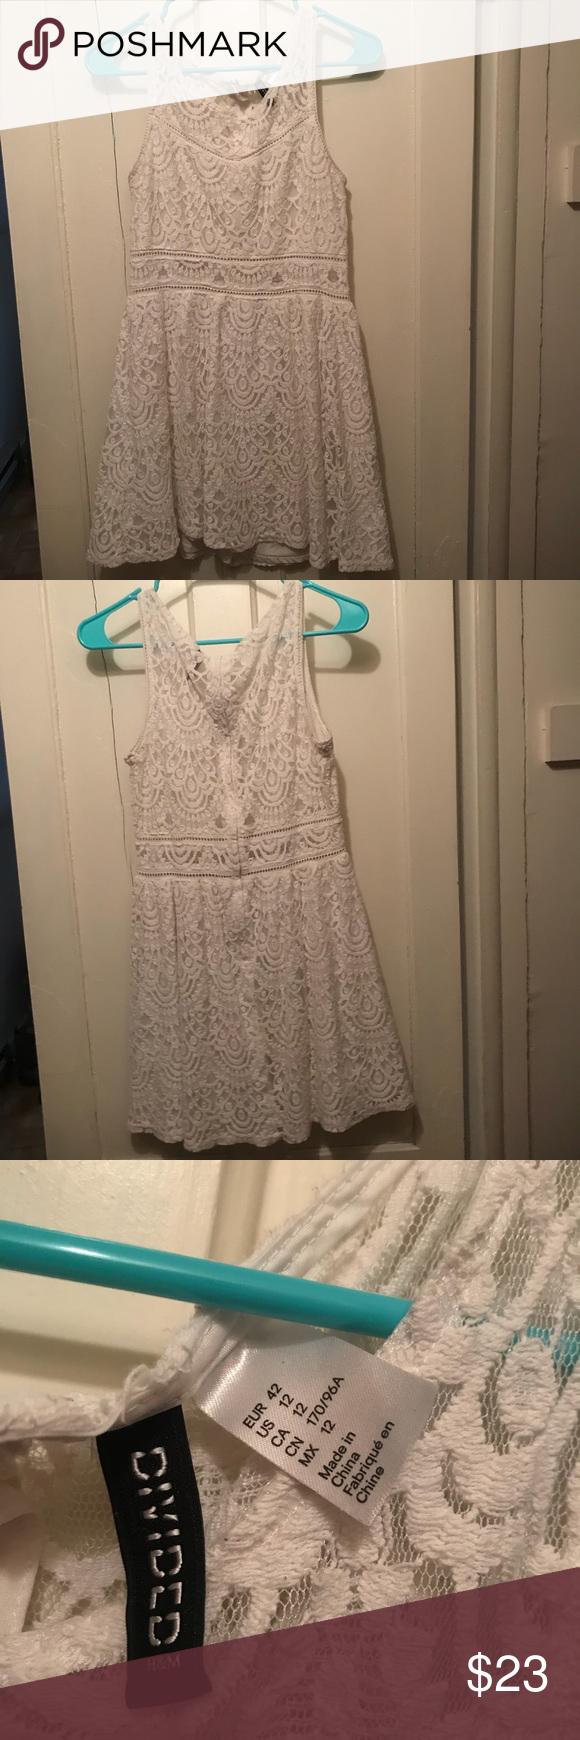 H&m lace dress white  HuM white lace dress  White lace dresses Nice dresses and White lace